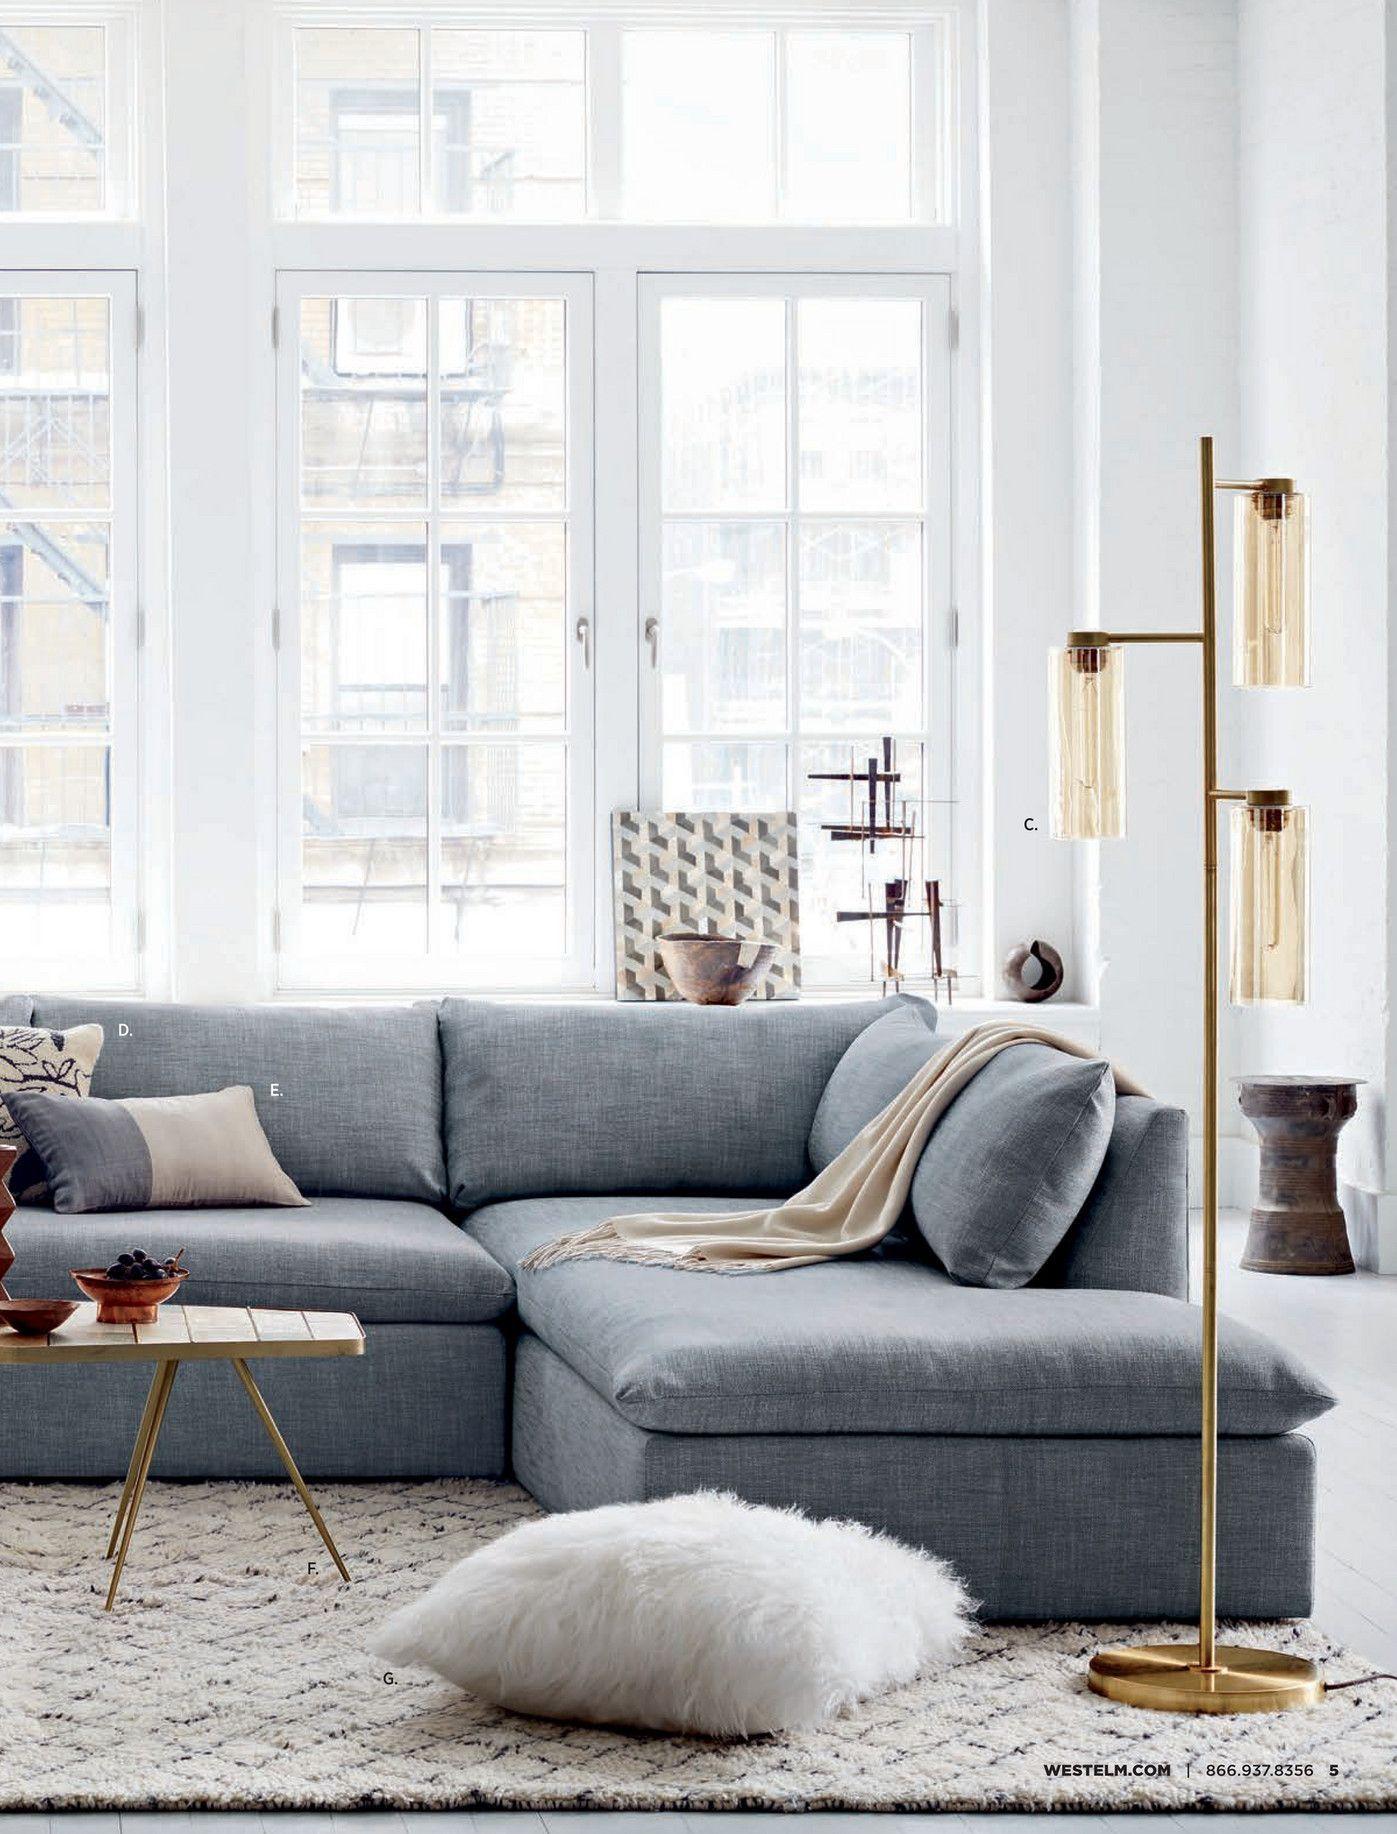 Professional Room Designer: Comfortable Sectional Sleeper Sofa Design Ideas